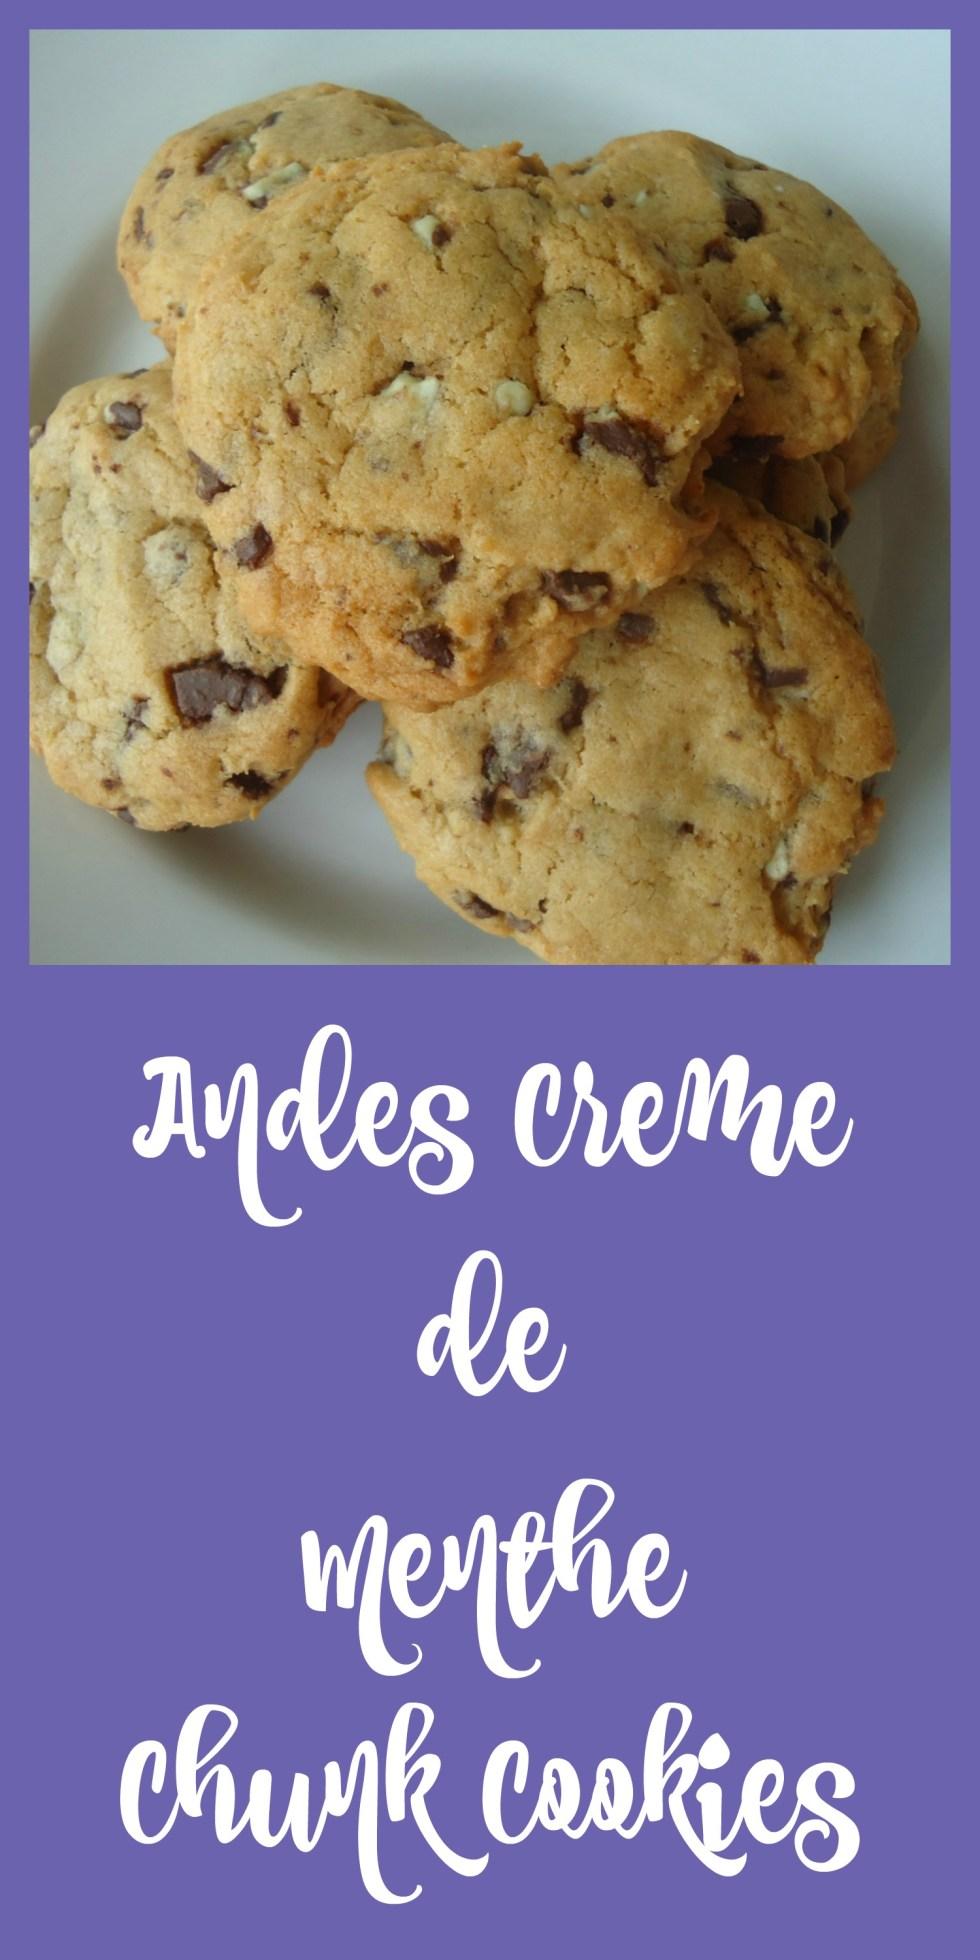 Andes Creme de Menthe Chunk Cookies